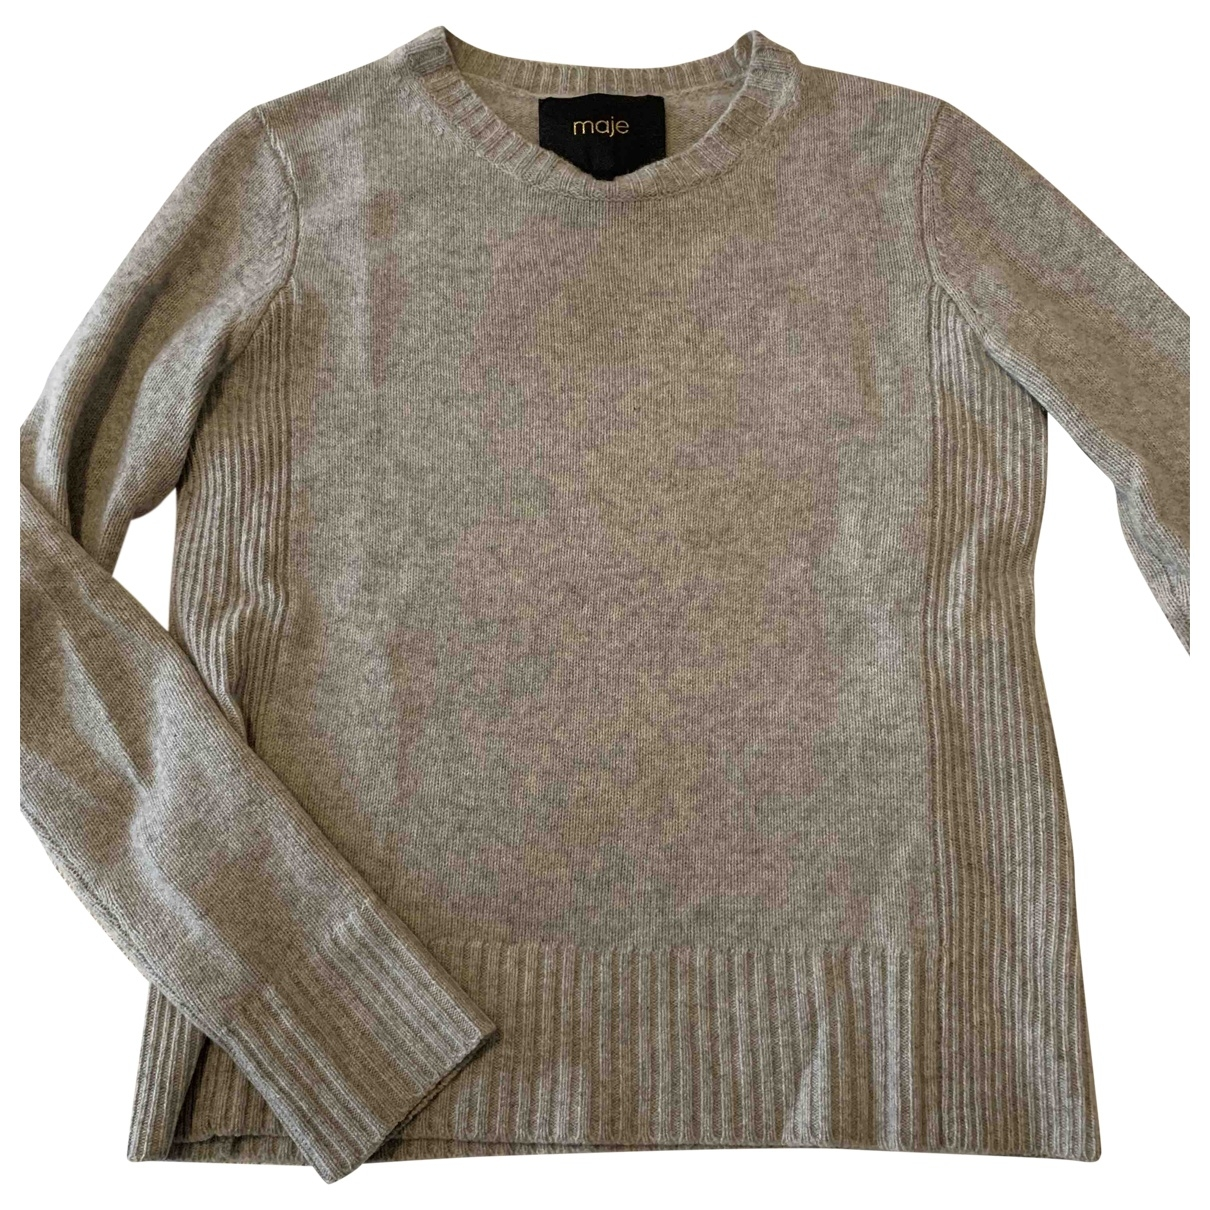 Maje \N Grey Cashmere Knitwear for Women 1 0-5